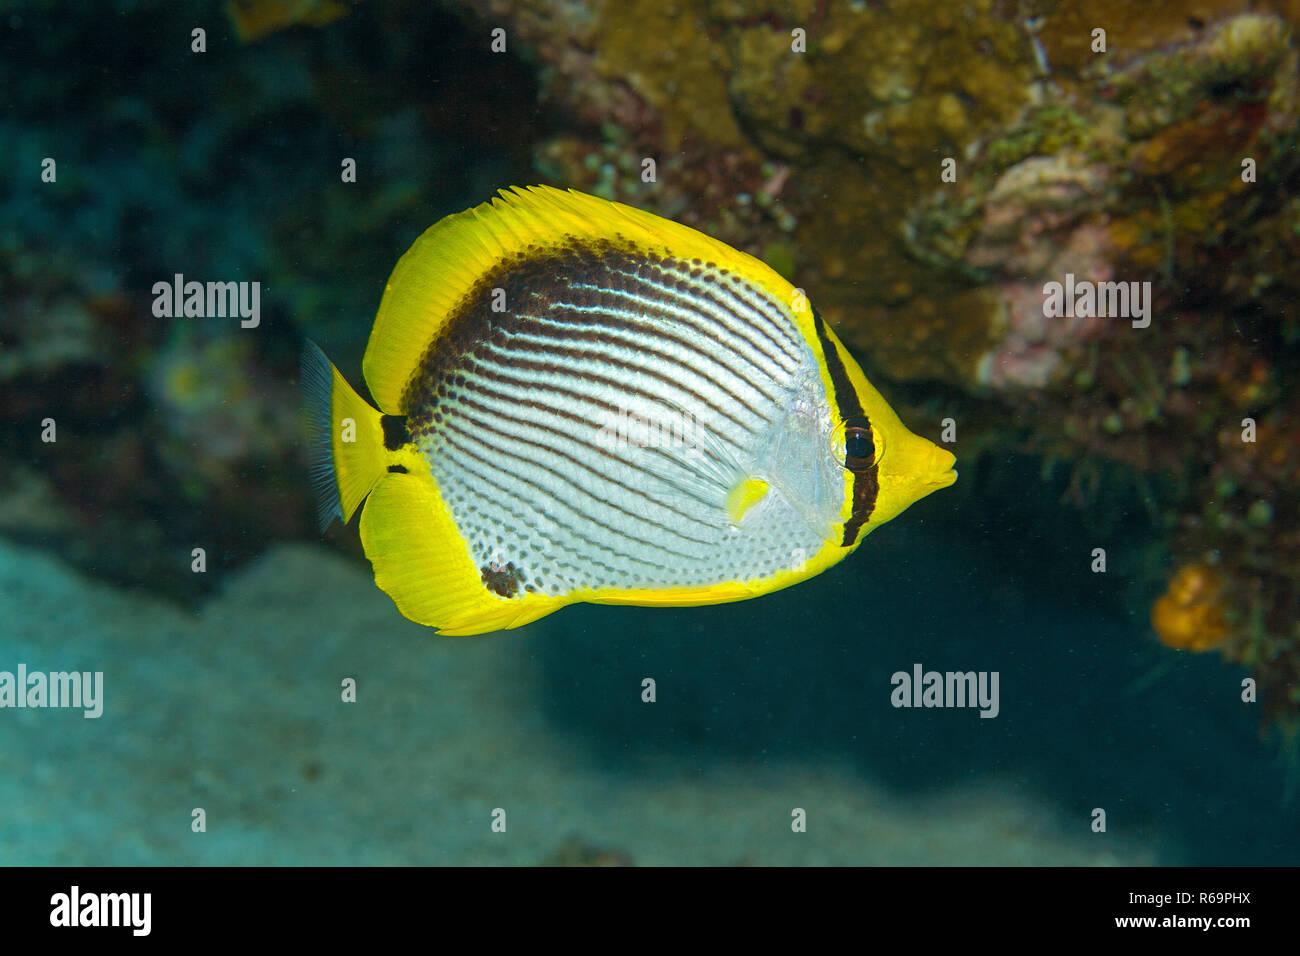 Blackback Butterflyfish (Chaetodon melannotus), Saparua, Cape Paperu, Moluccas, Indonesia Stock Photo